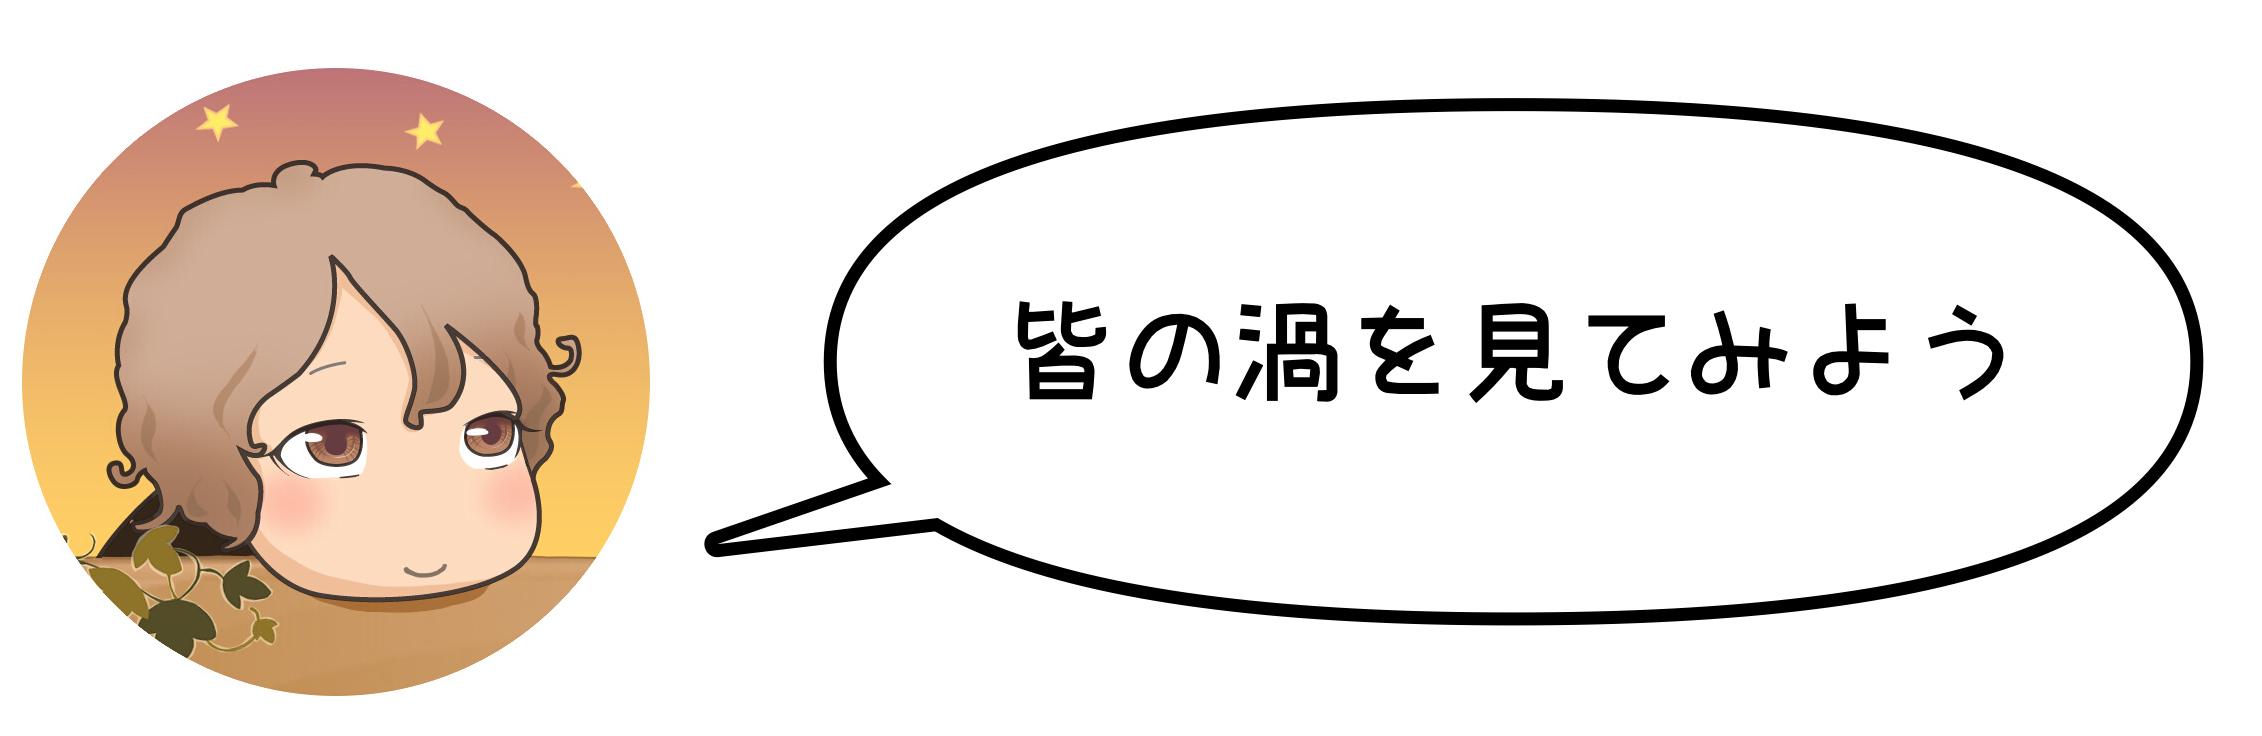 IMG_7831.jpg